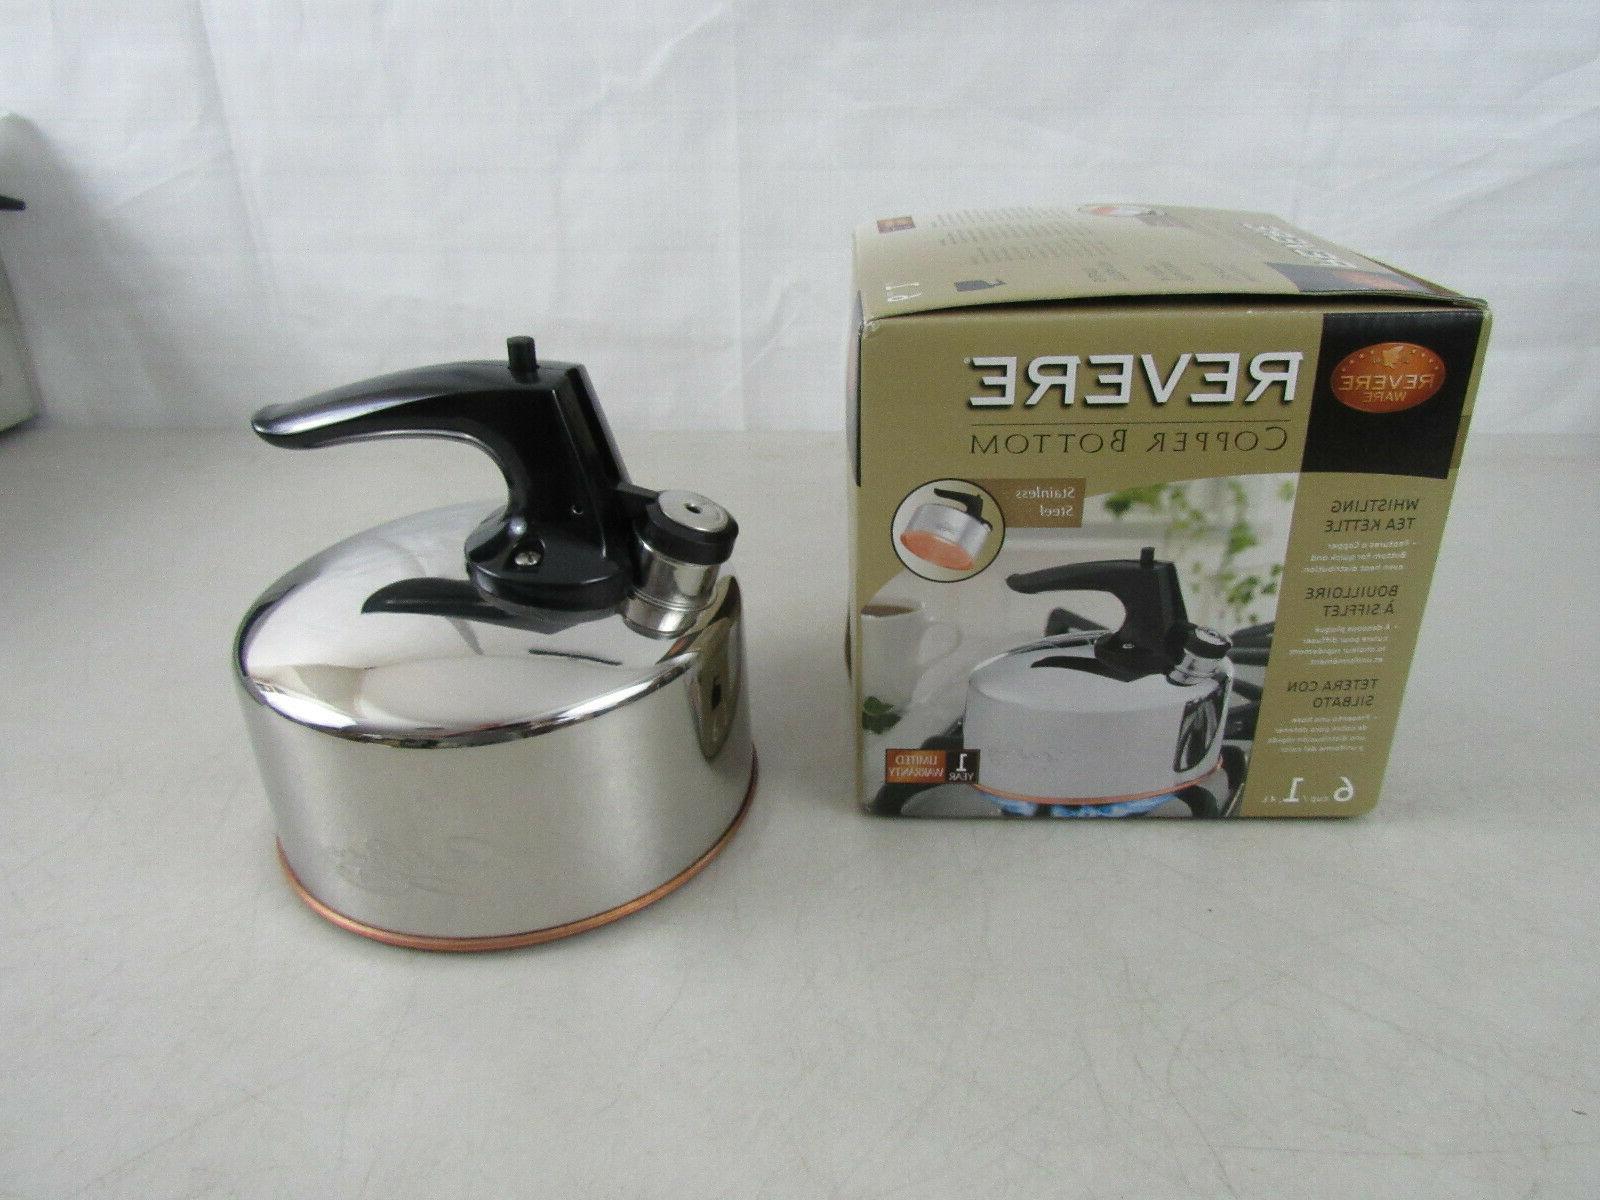 Revere Ware Whistling Tea Kettle 6 Cup NIB Copper Bottom Sta